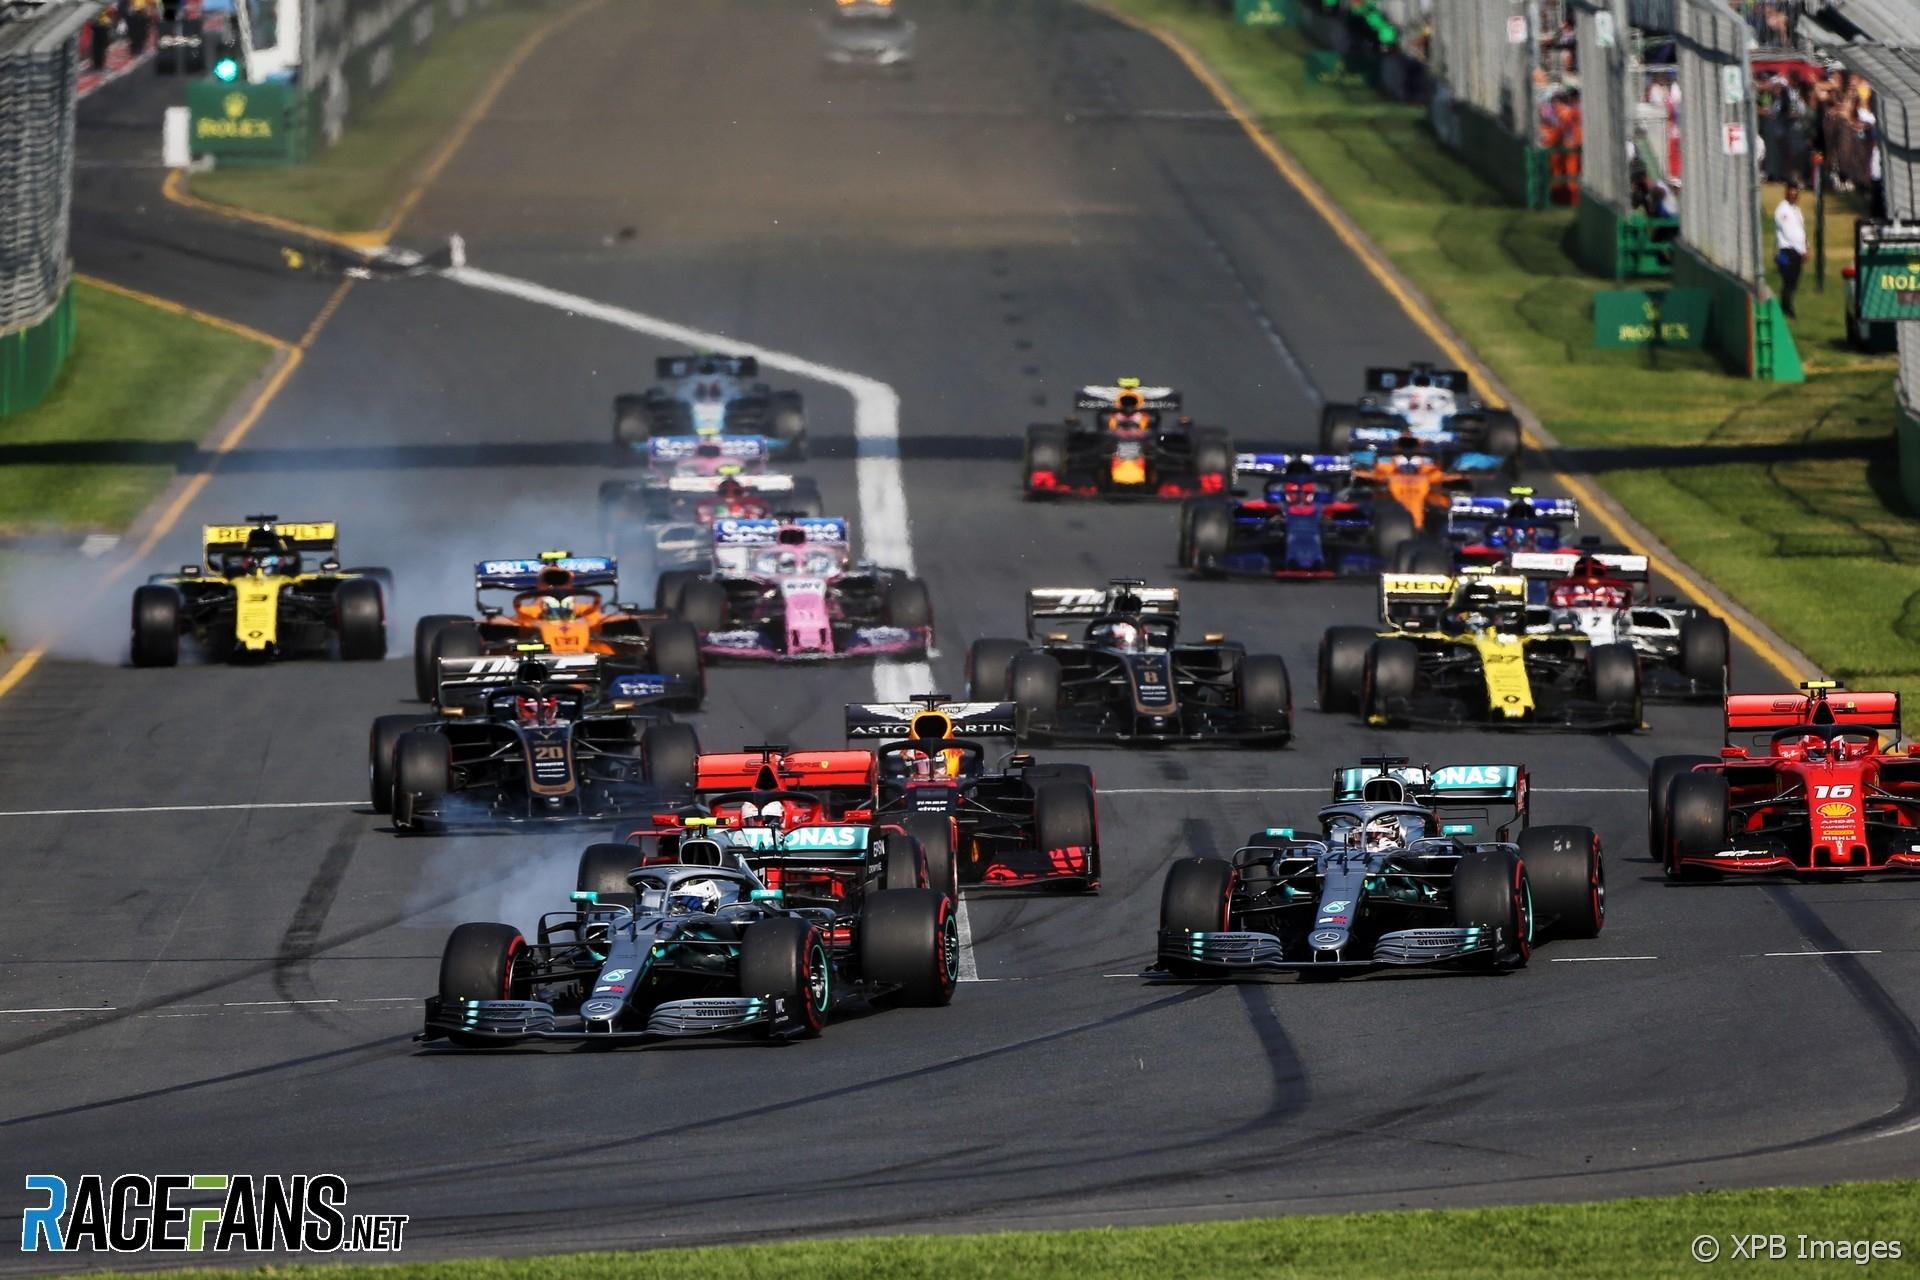 F1 Calendarracefans: Get The Current Formula 1 Race Schedule